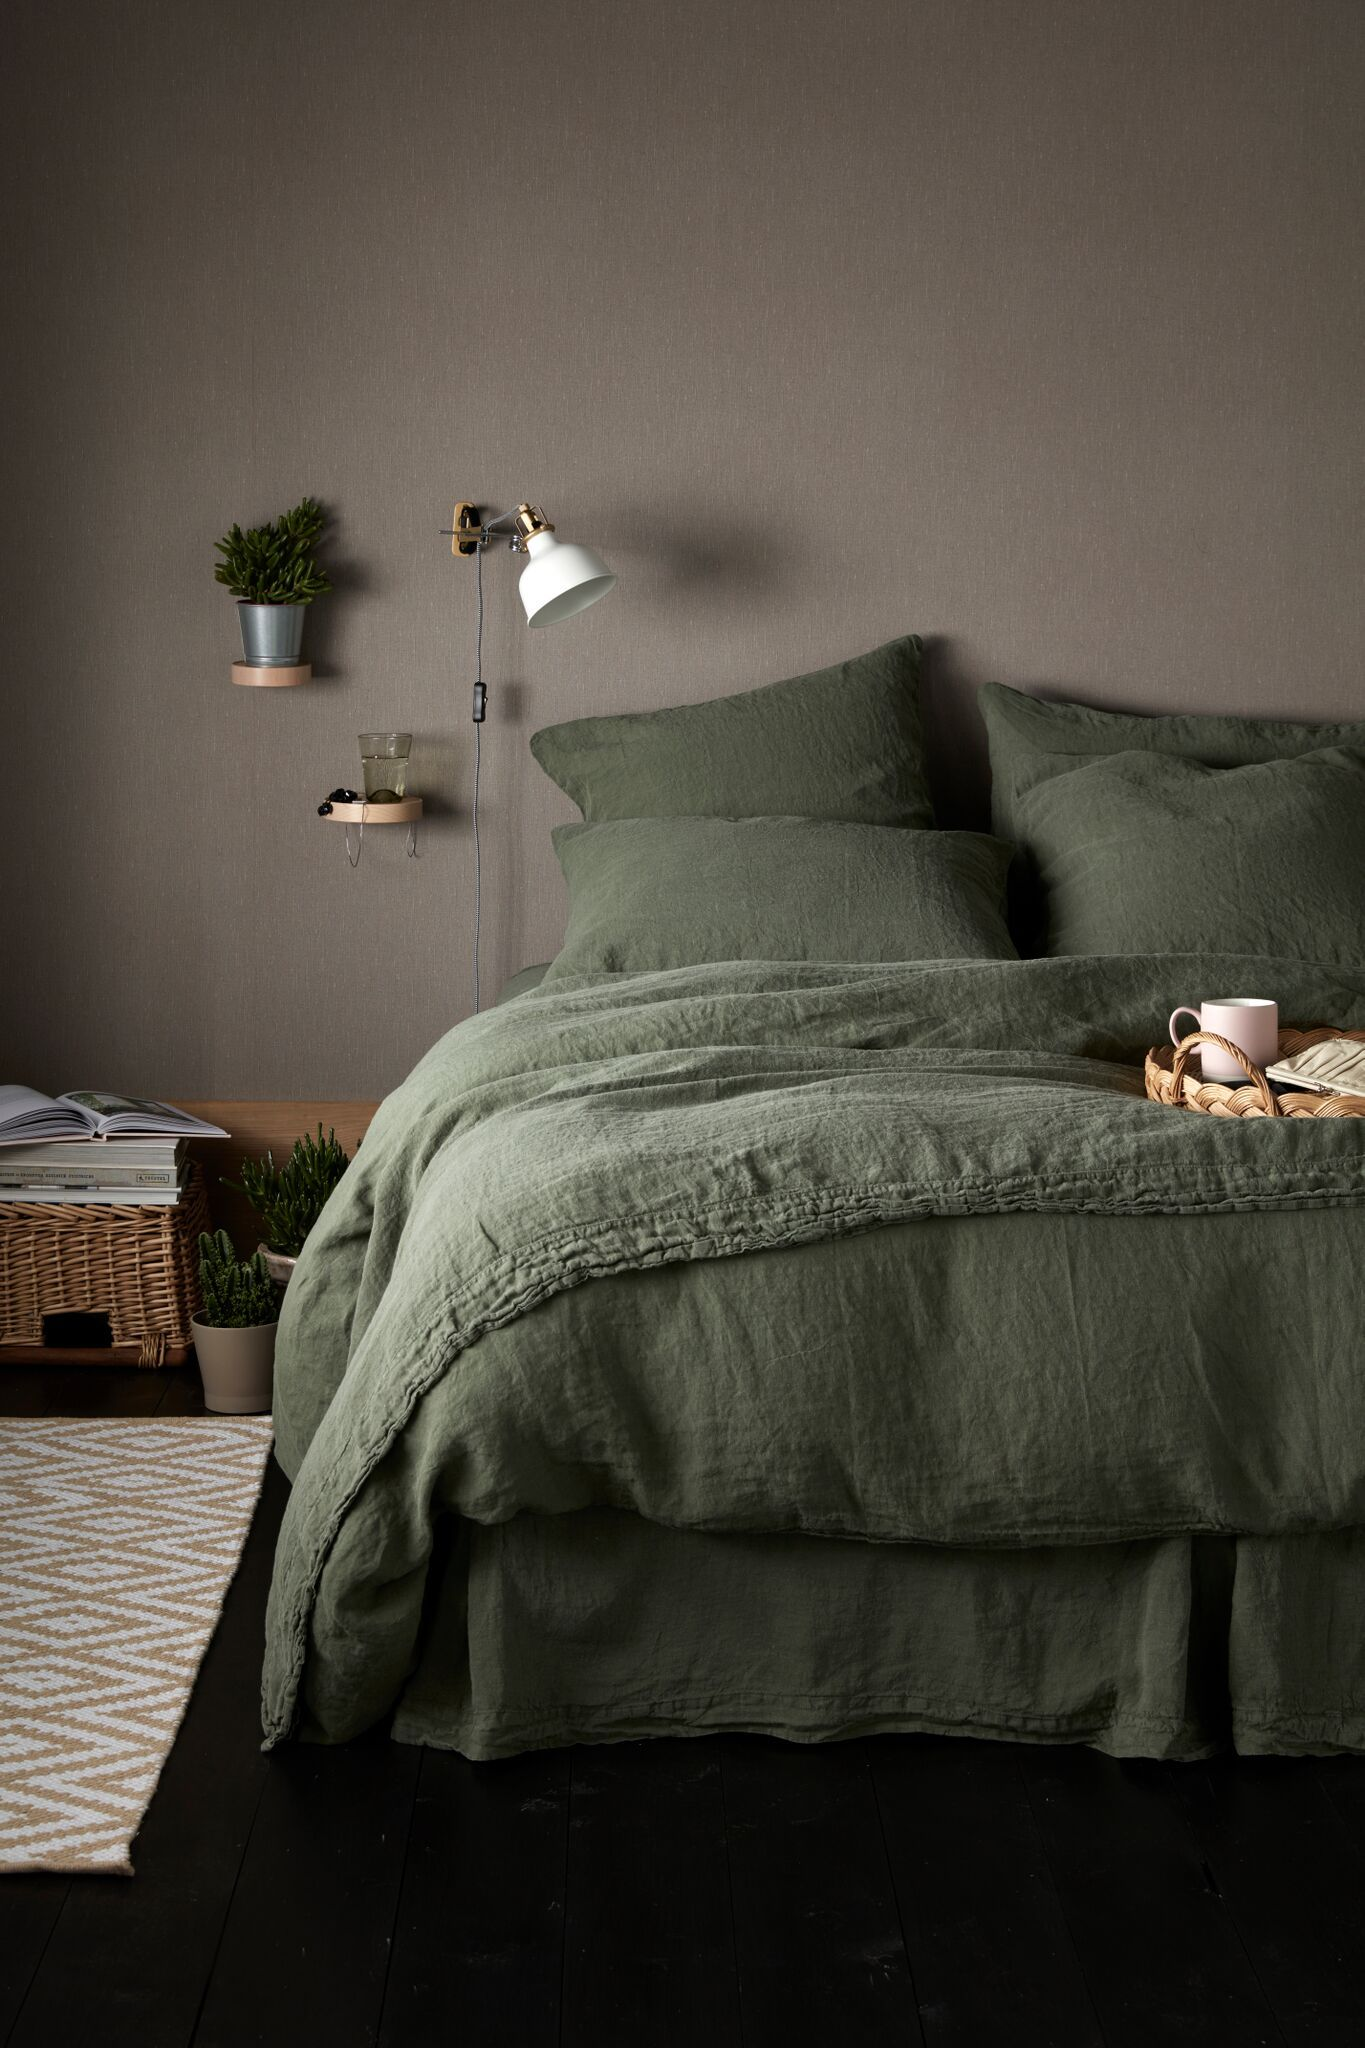 Top Gray Linen Bedding Photograph Of Bed Design